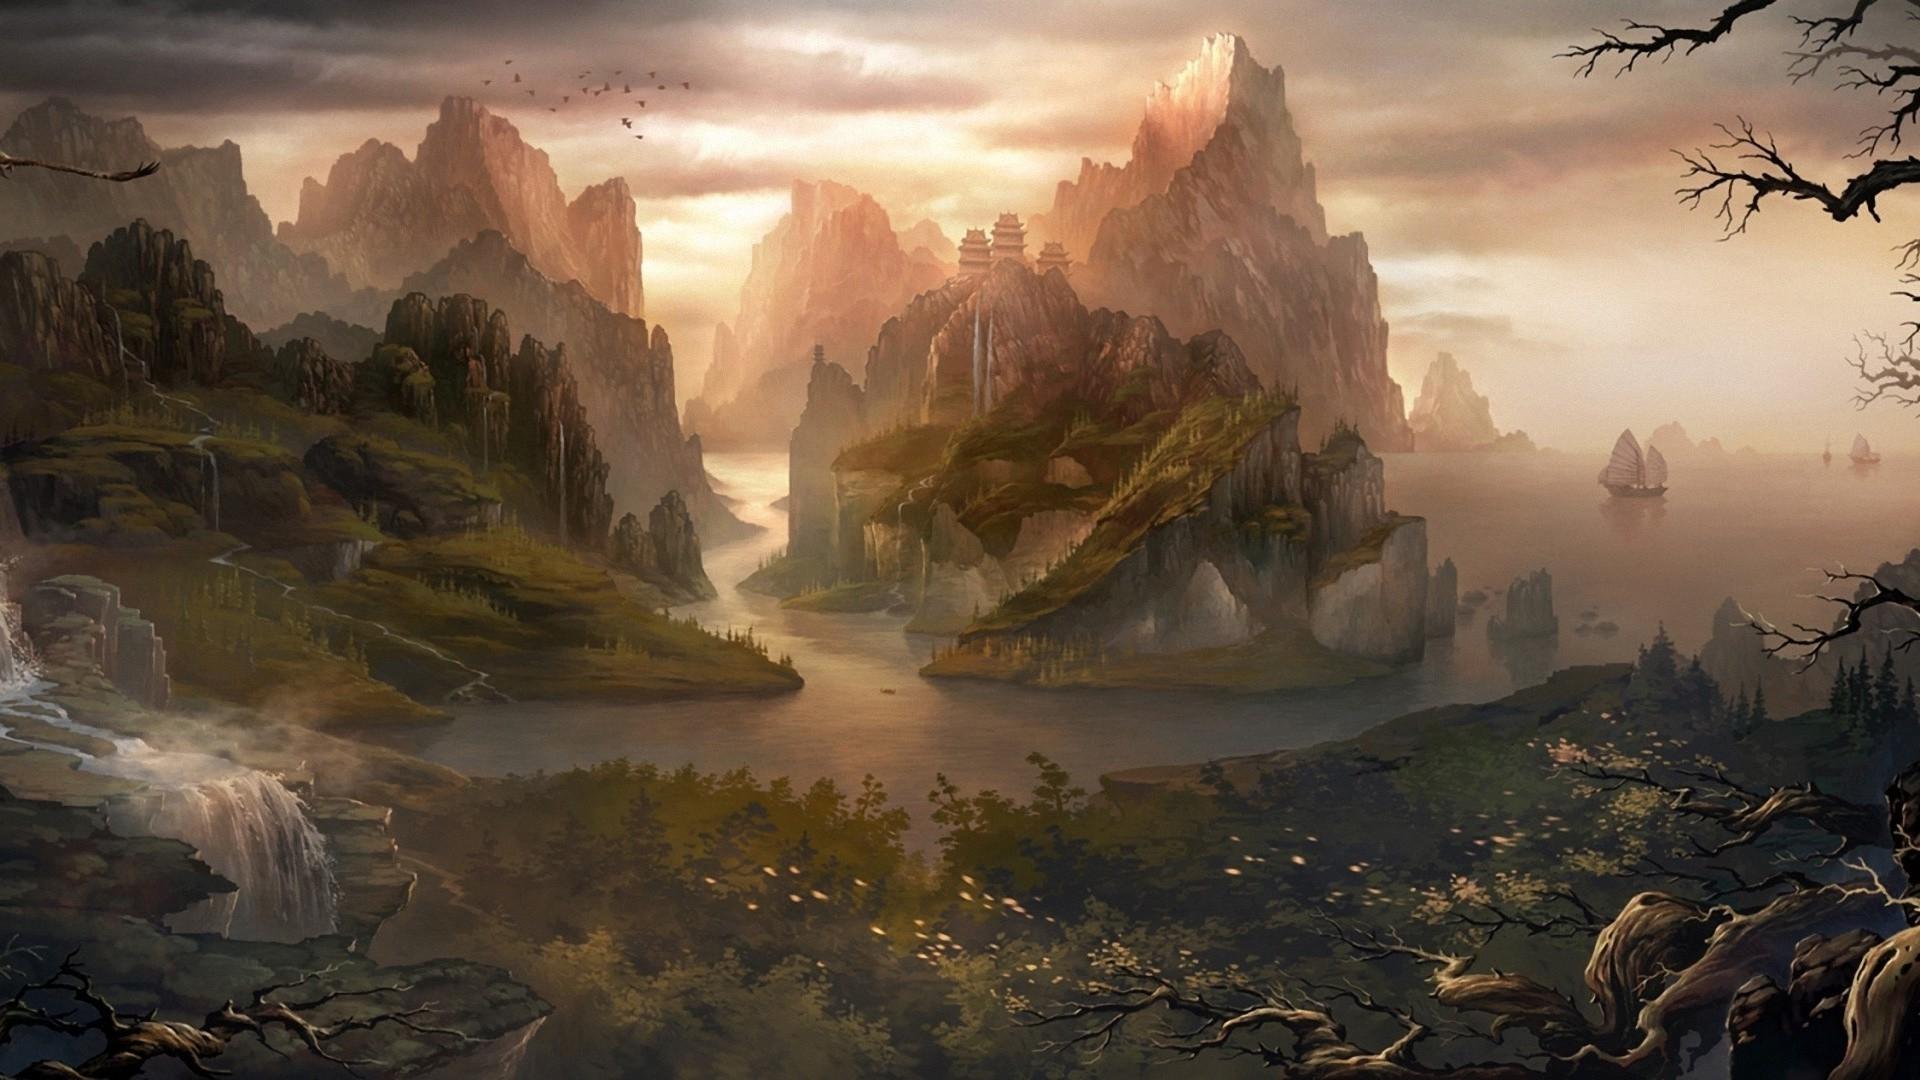 Fantasy Wallpapers 449 1920x1080 px ~ HDWallSource.com